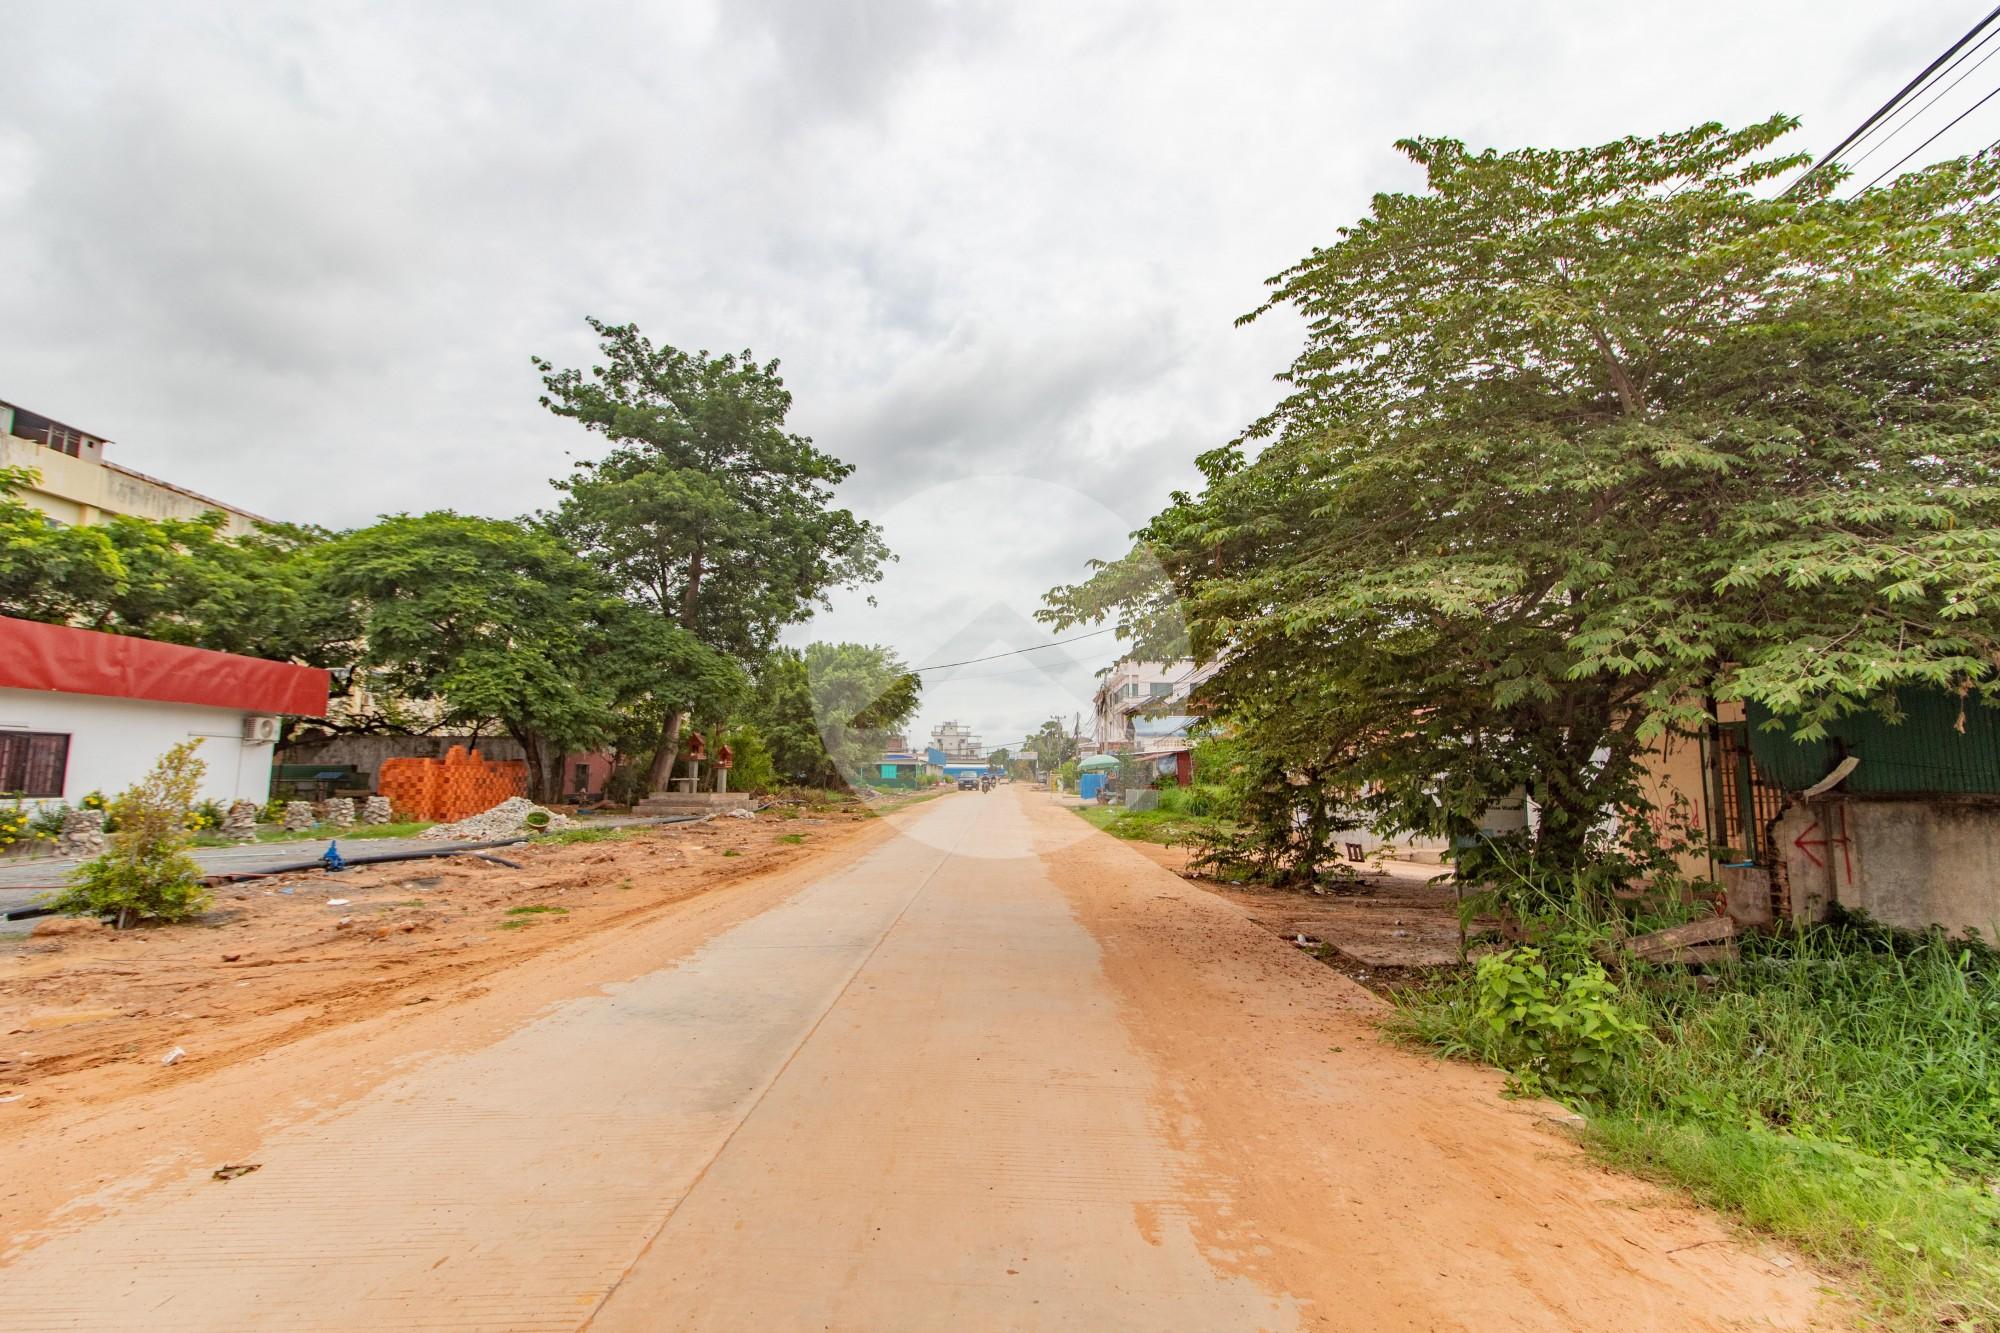 1441 Sqm Commercial Land For Sale - Svay Dangkum, Siem Reap